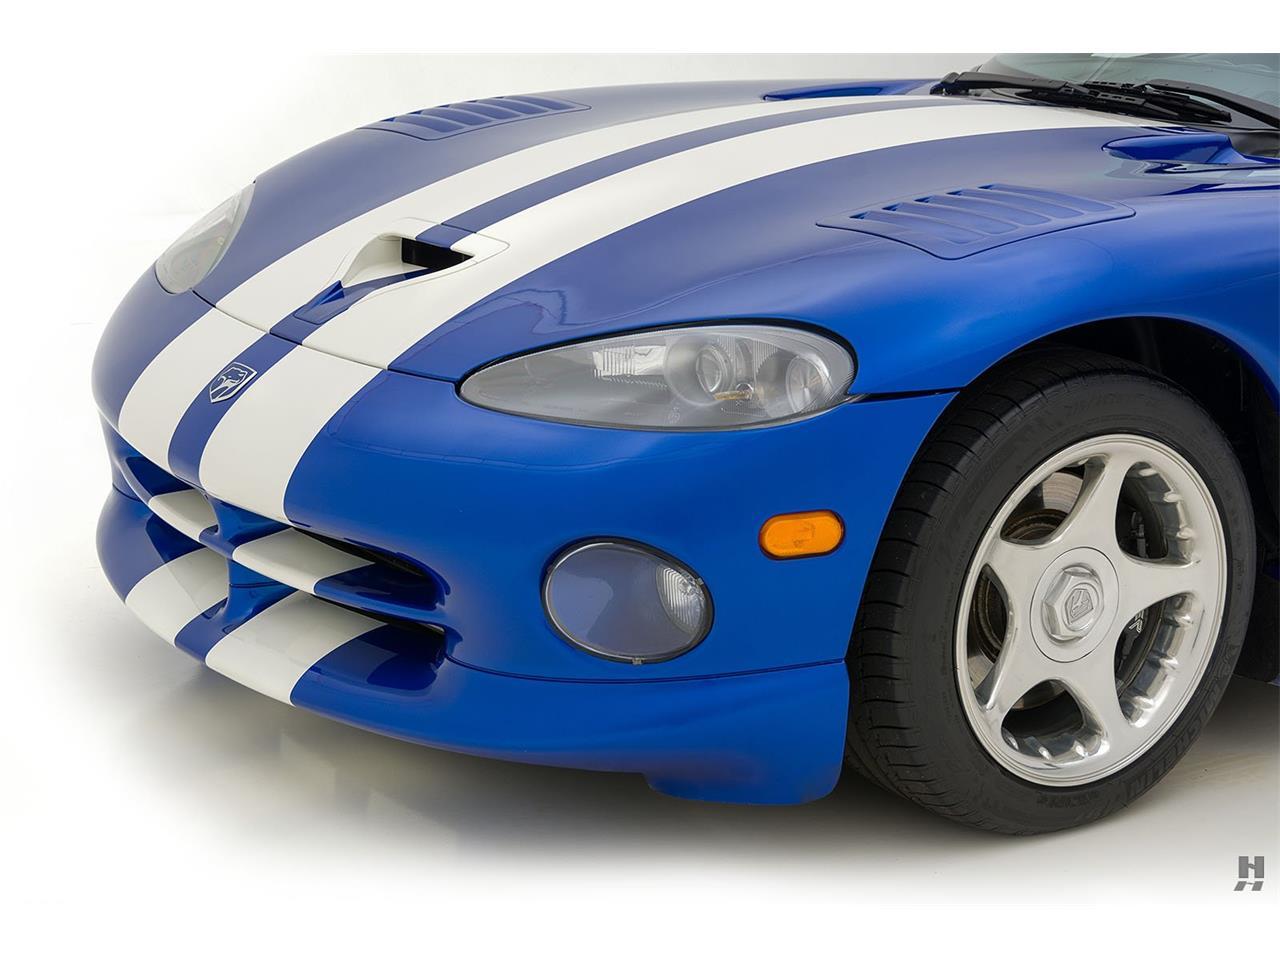 1996 Dodge Viper (CC-1421044) for sale in Saint Louis, Missouri